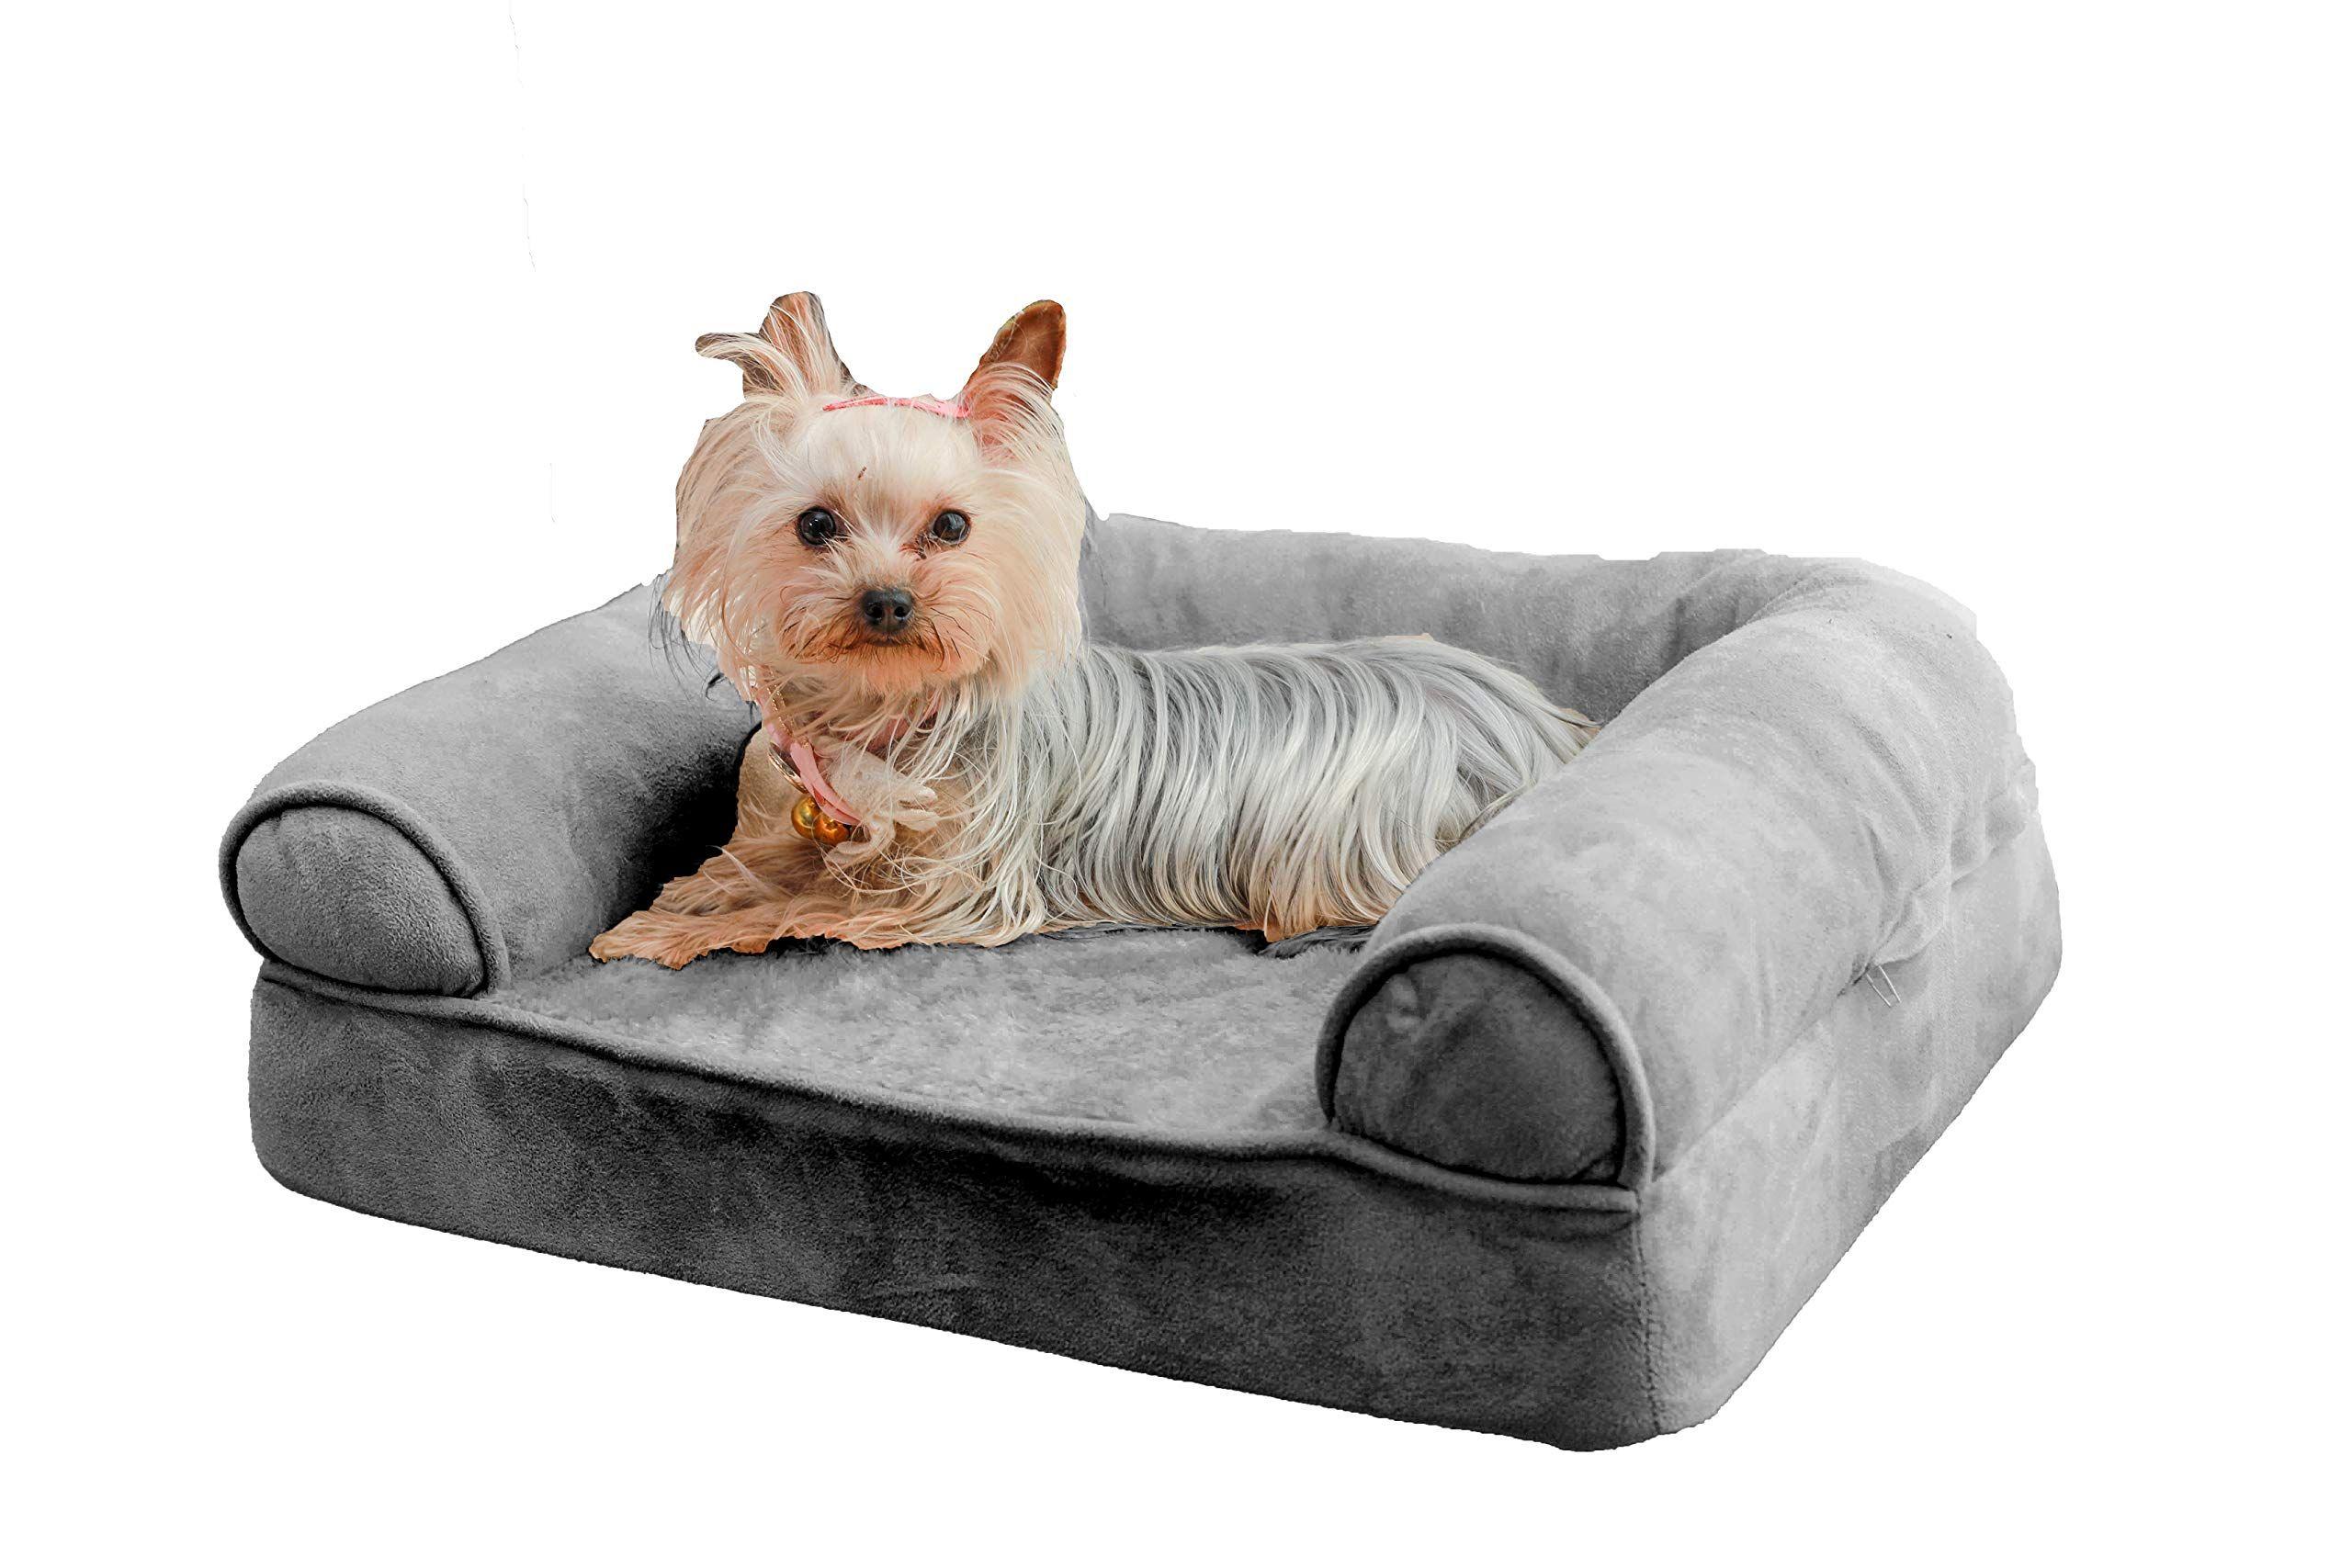 Large Orthopedic Dog Sofa Bed, Comfortable Sofa Style Pet